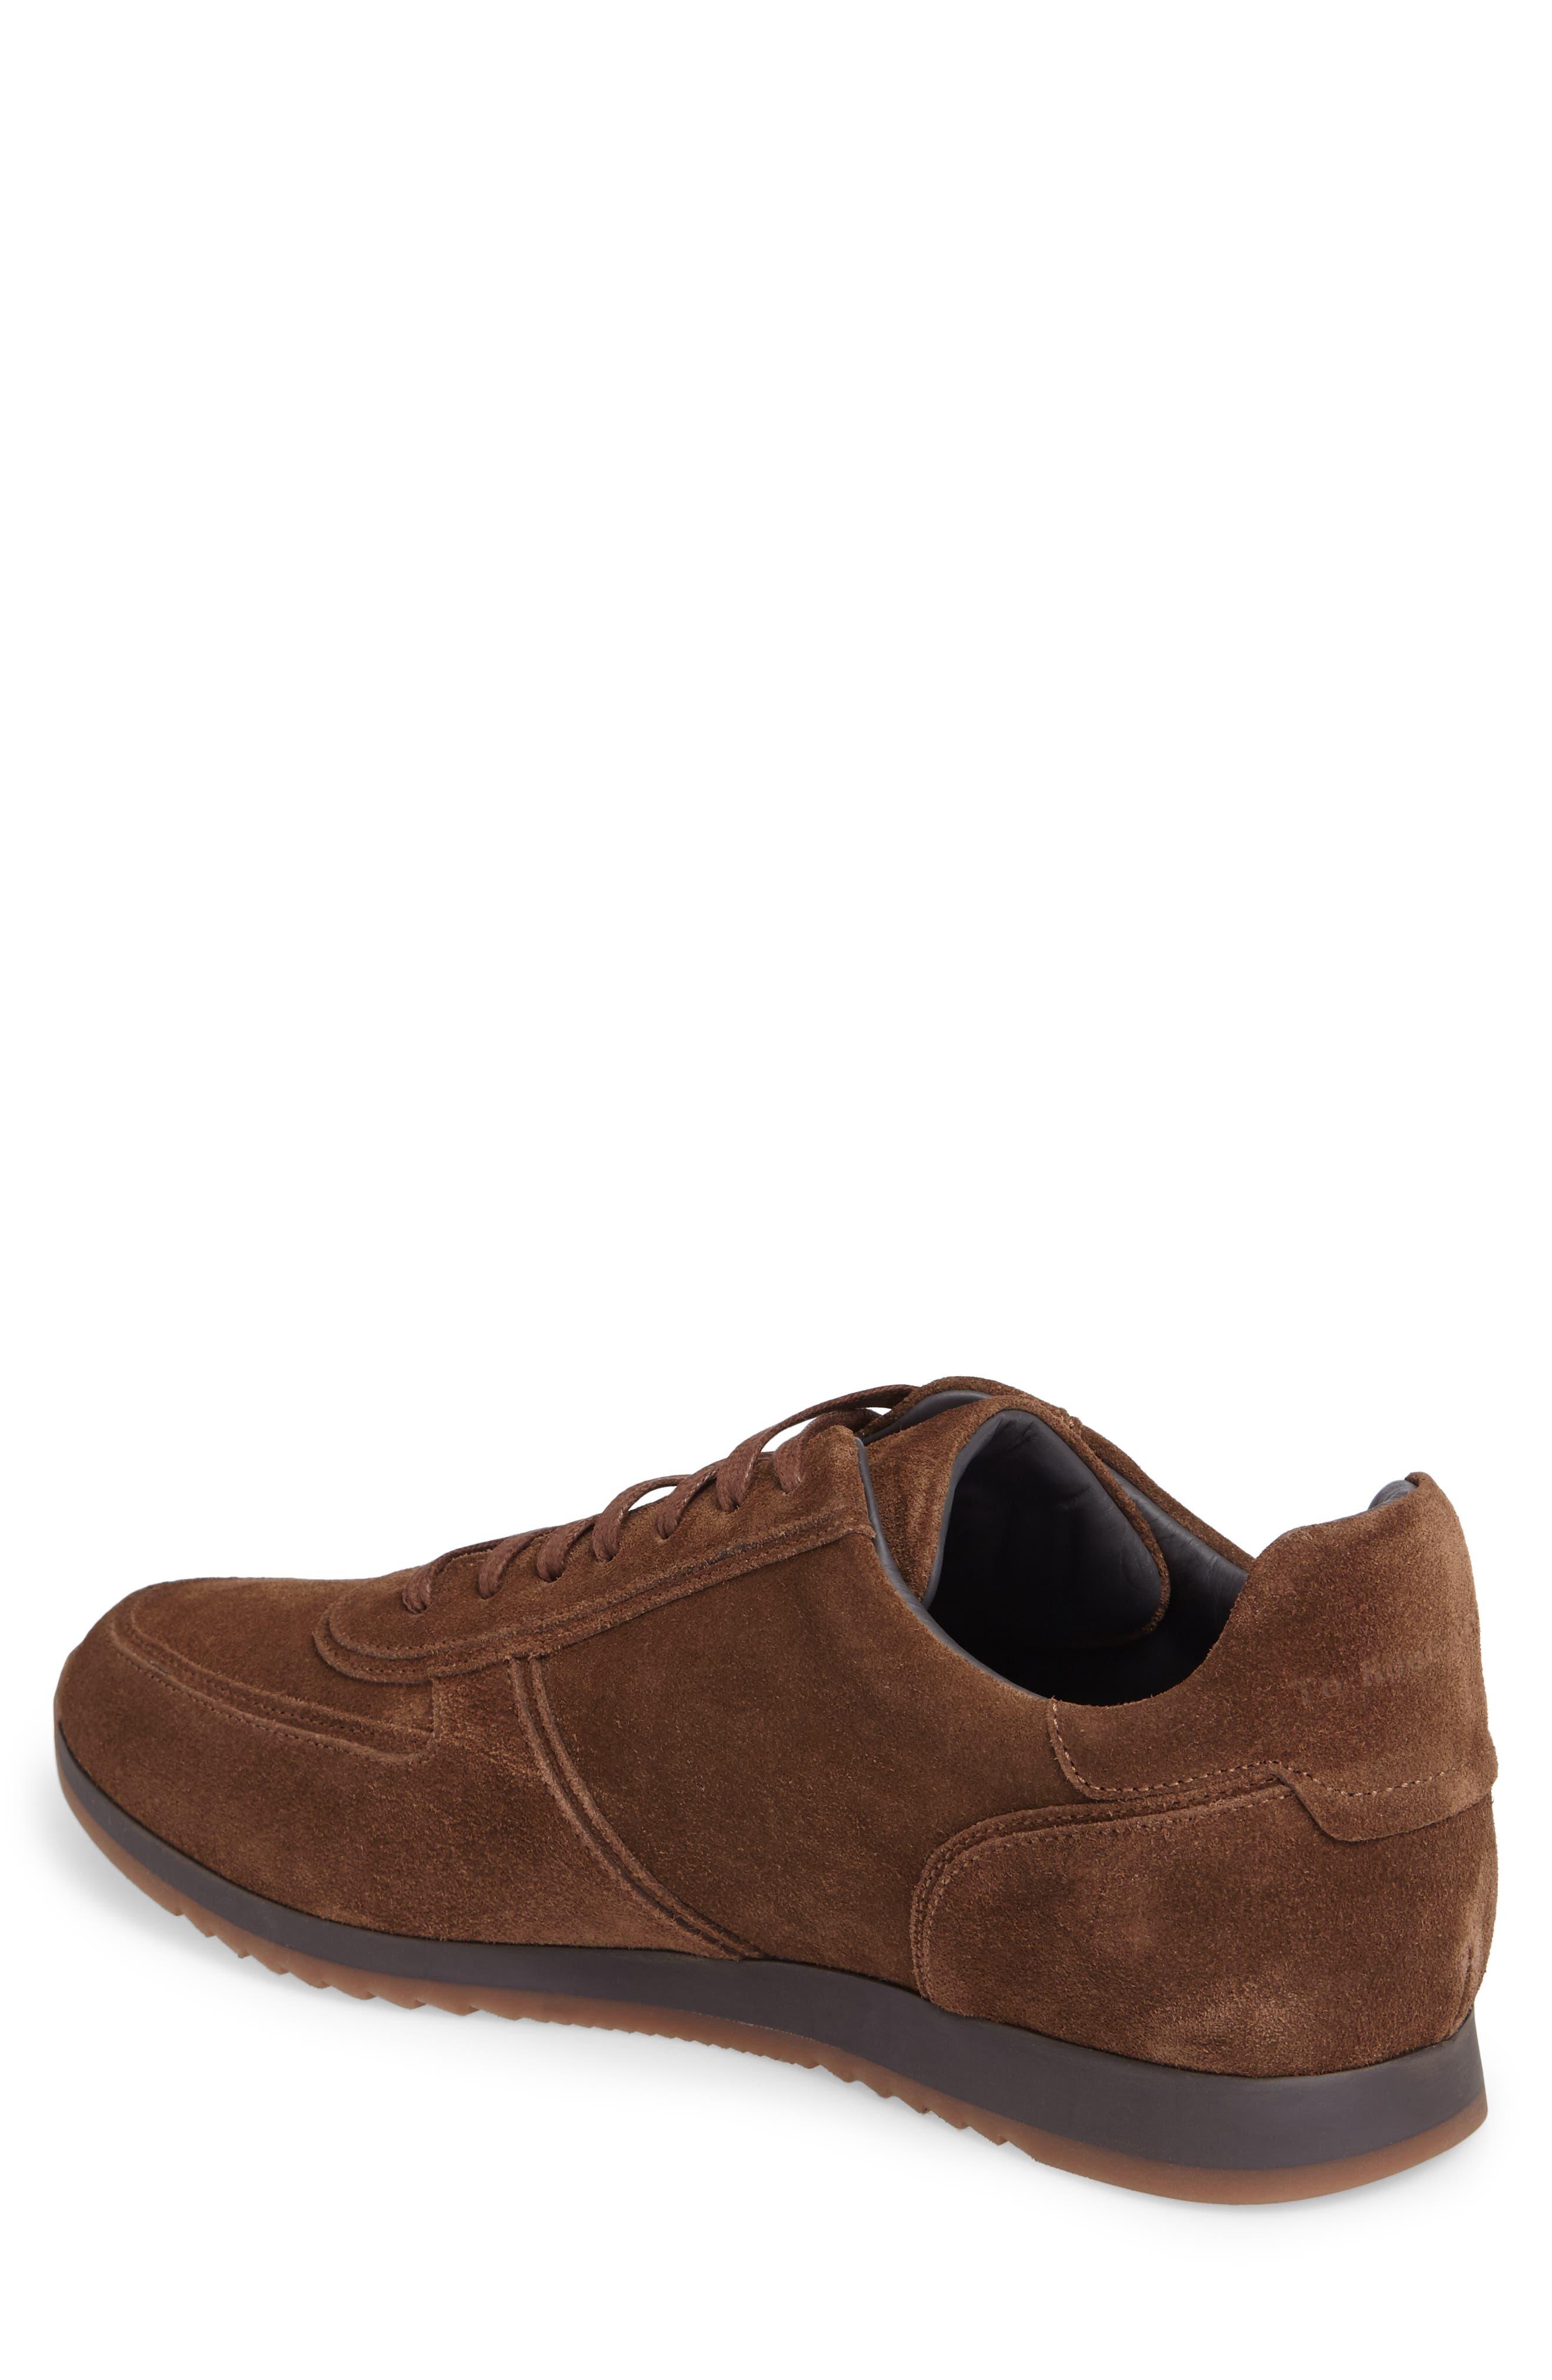 Hatton Sneaker,                             Alternate thumbnail 2, color,                             Softy Marrone